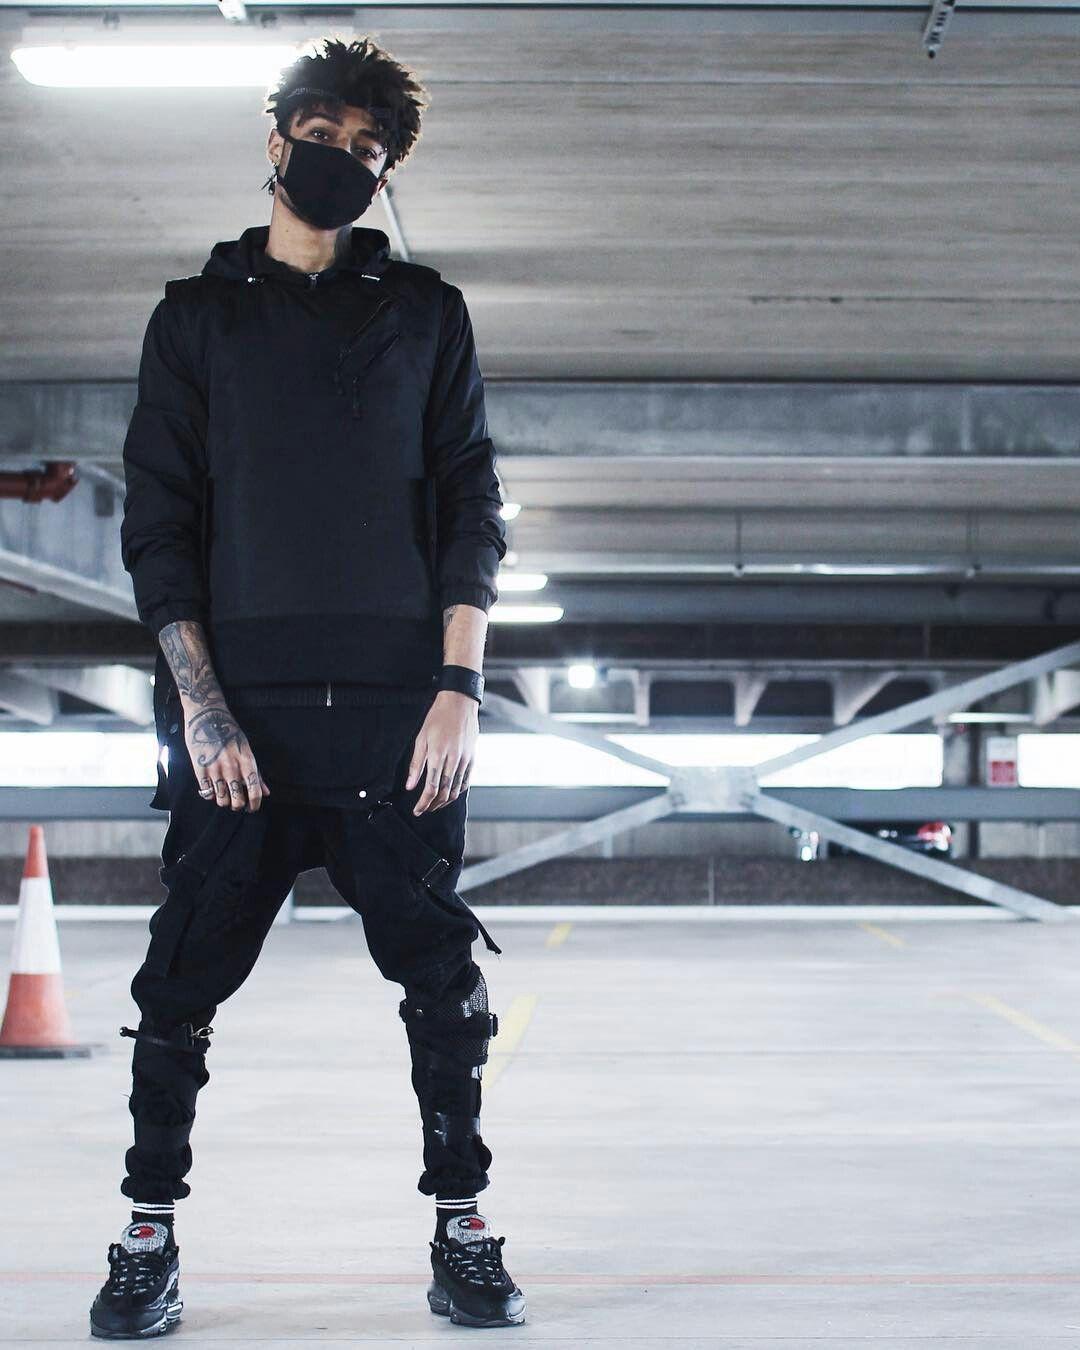 Street Style Boy, Streetwear Fashion